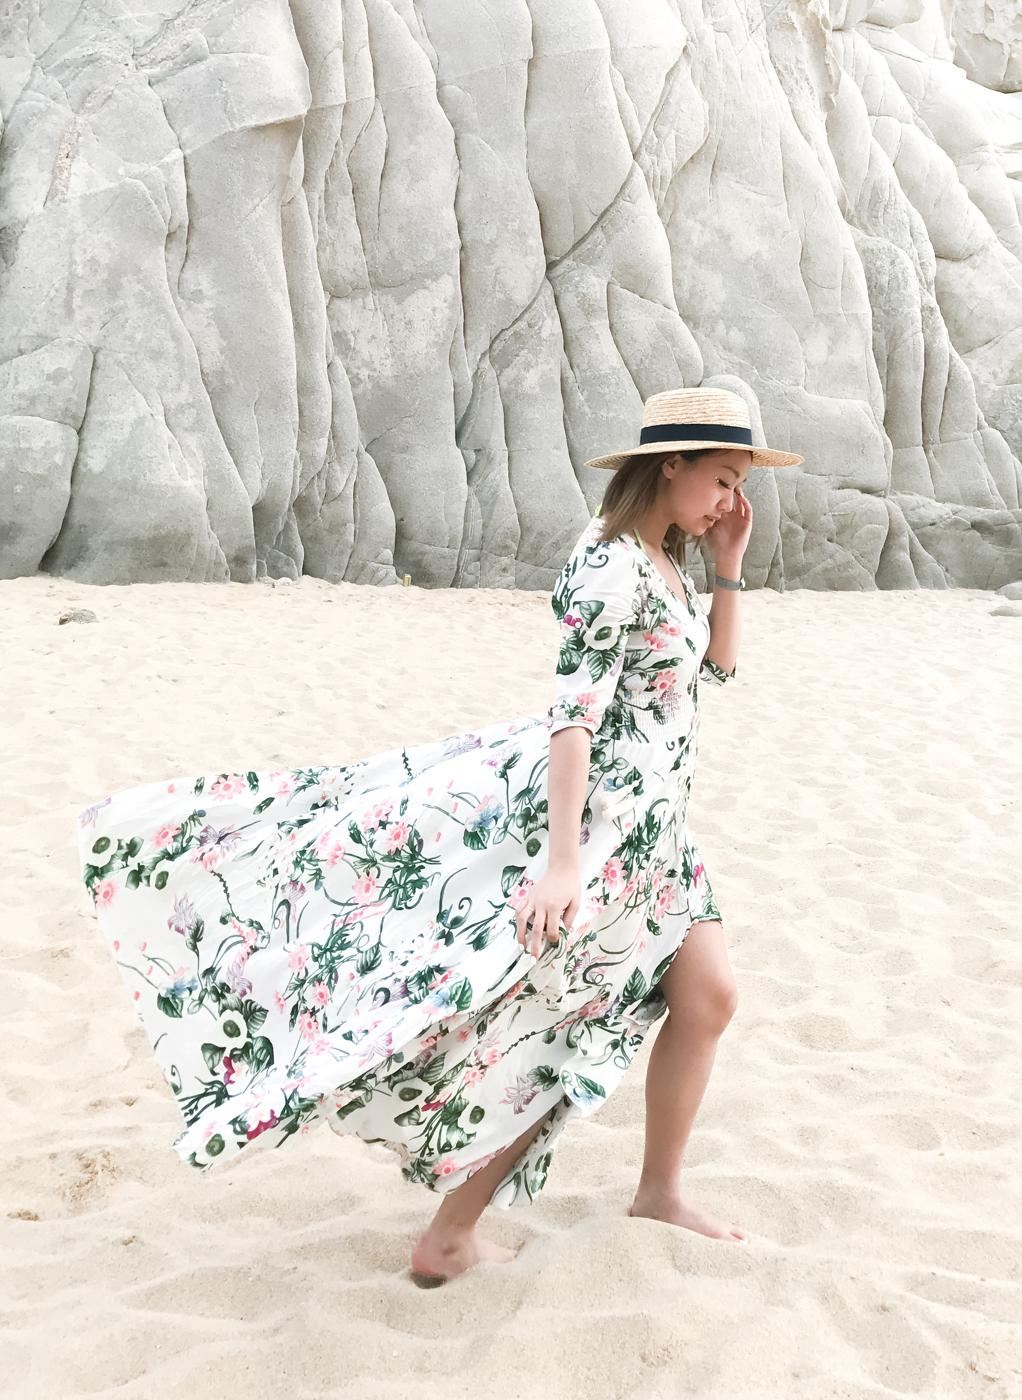 ShowPo Maxi Dress & San Diego Hat Company Straw Hat | The Chic Diary